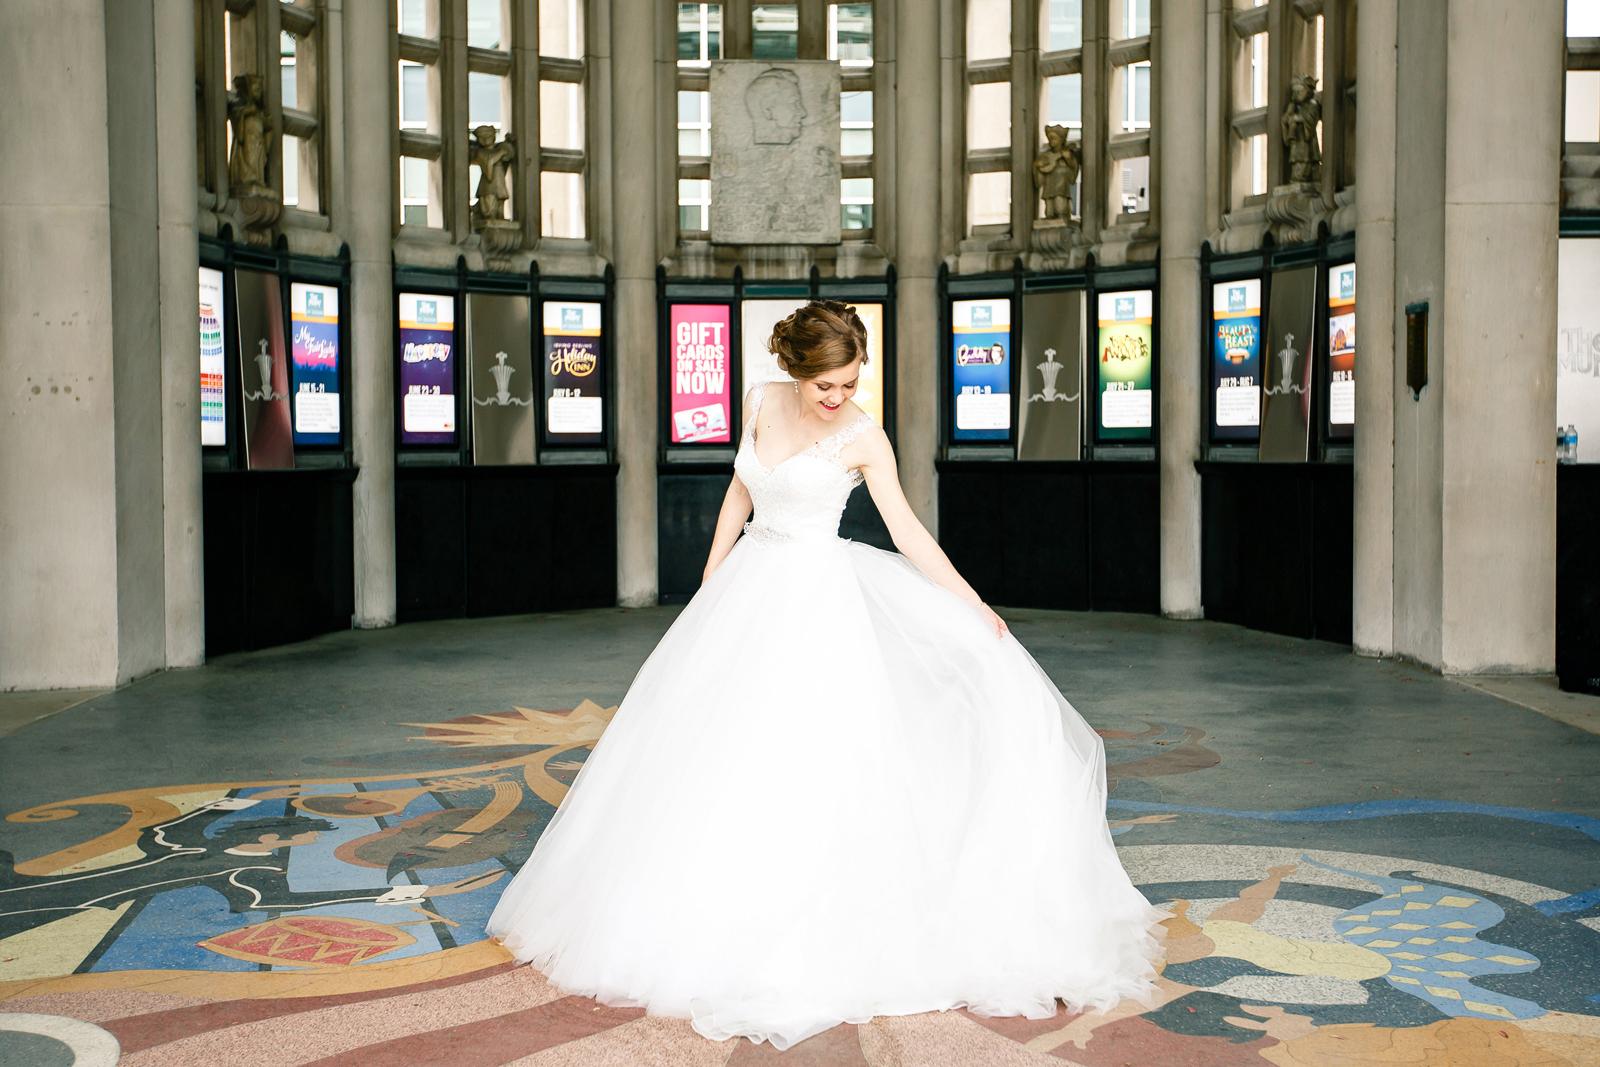 Bride Groom The Muny Schnucks Florist St Louis Wedding Photographer Oldani Photography 1.jpg